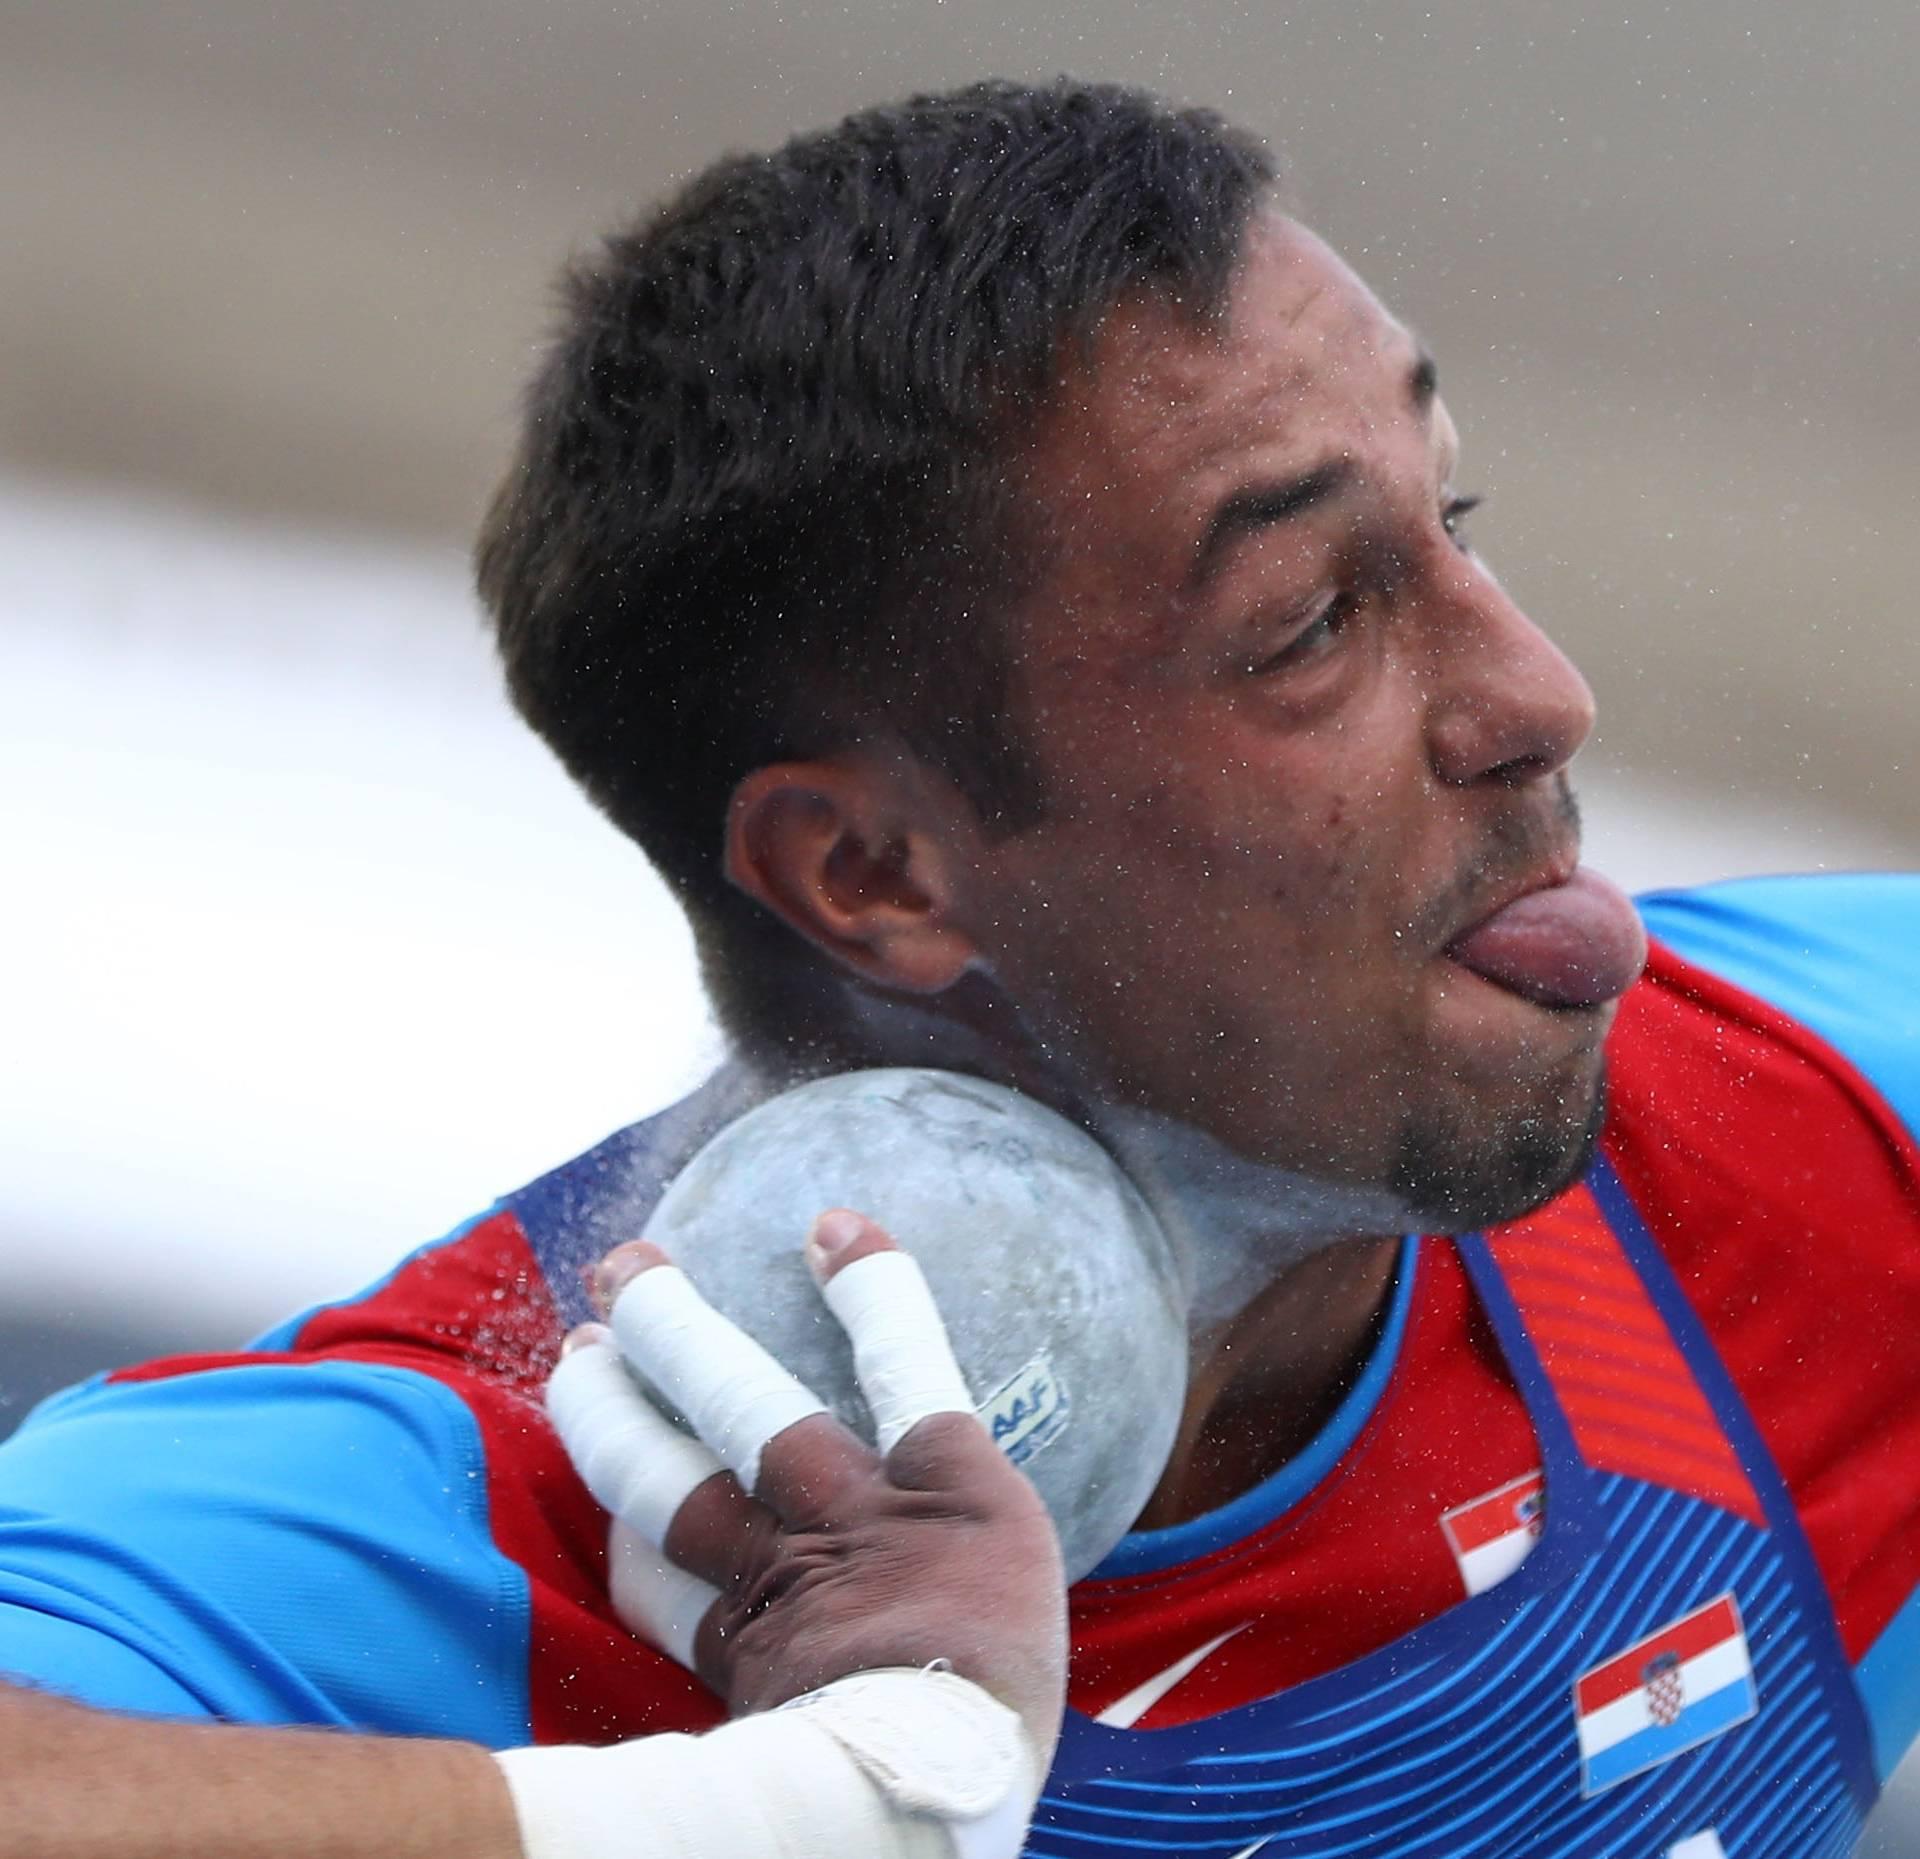 Athletics - Men's Shot Put Qualifying Round - Group B